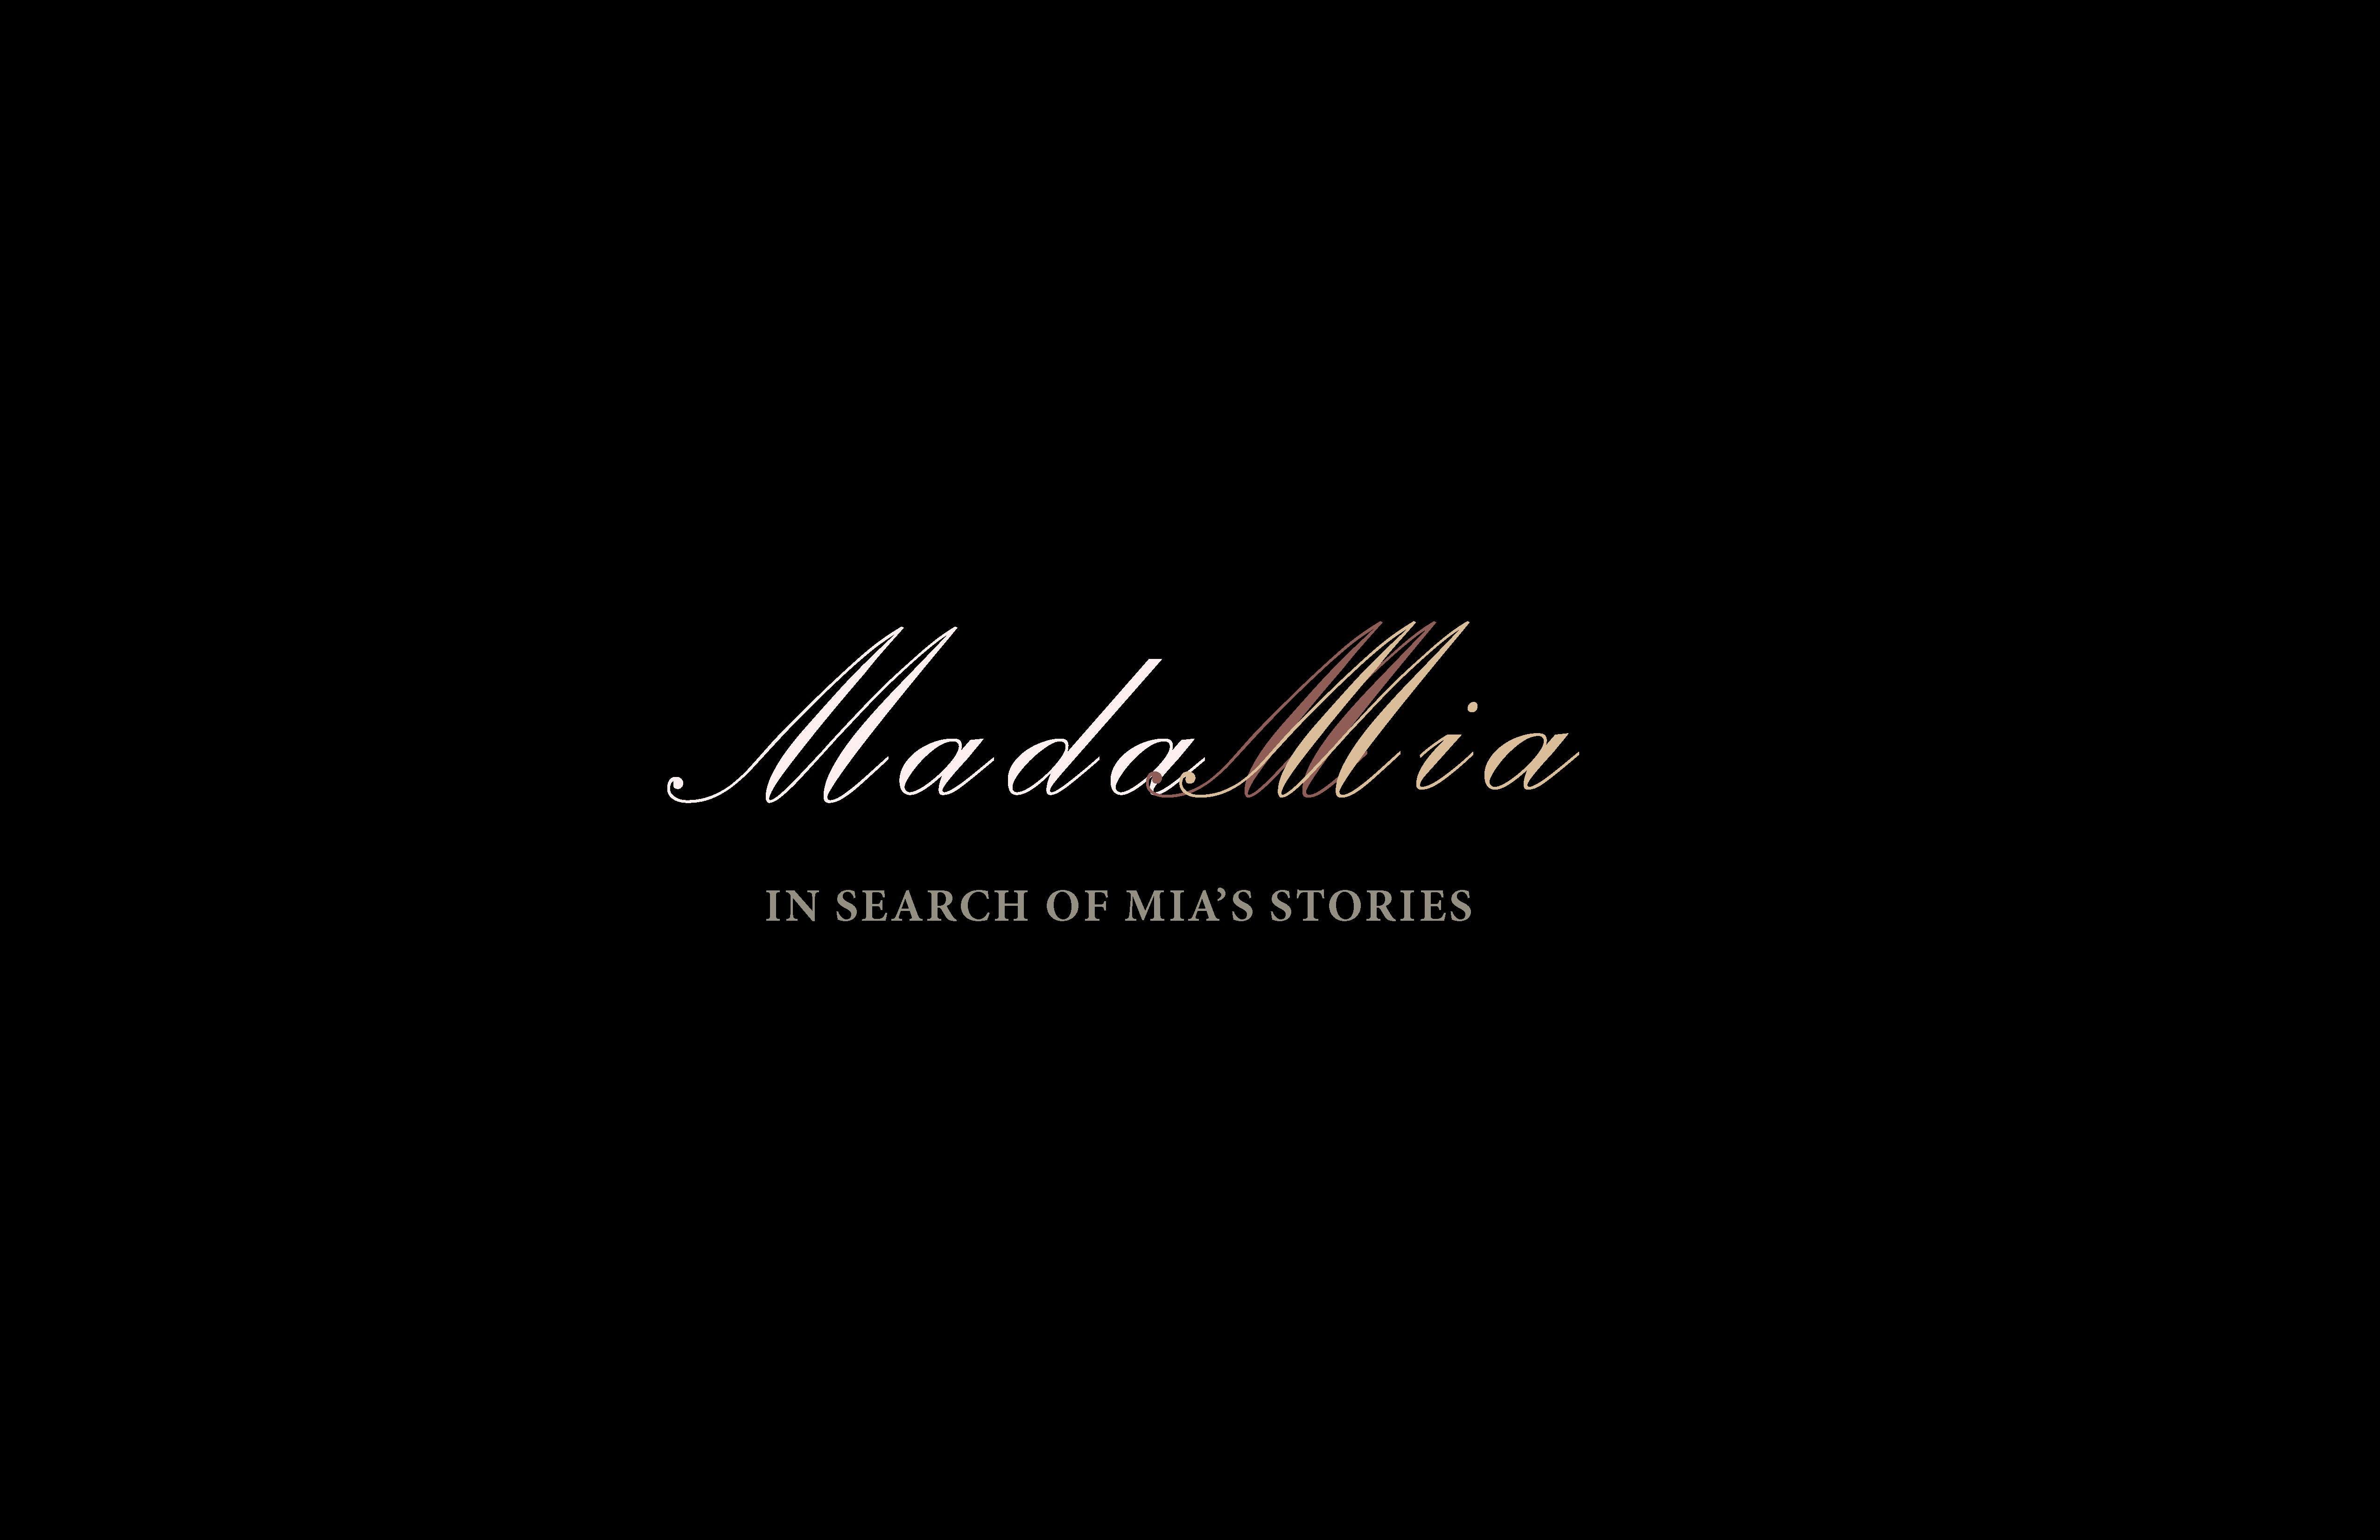 Madam mia page 02